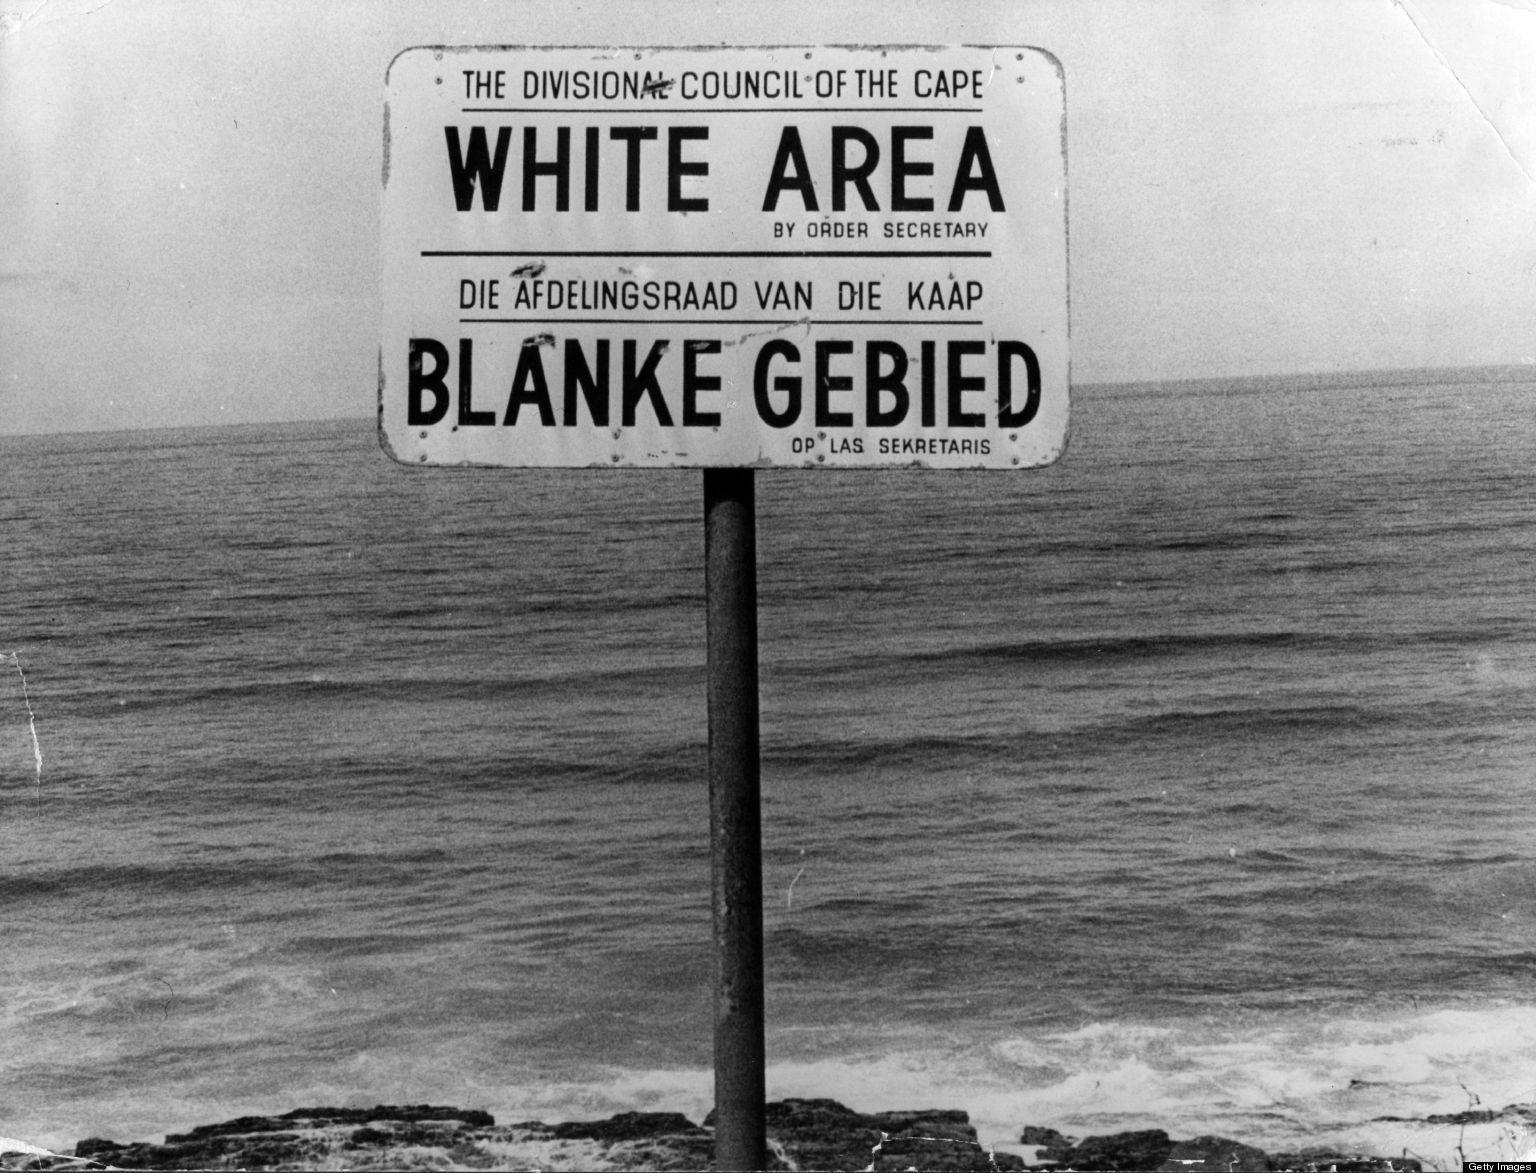 ob_d212a2_o-apartheid-history-timeline-nelson-ma